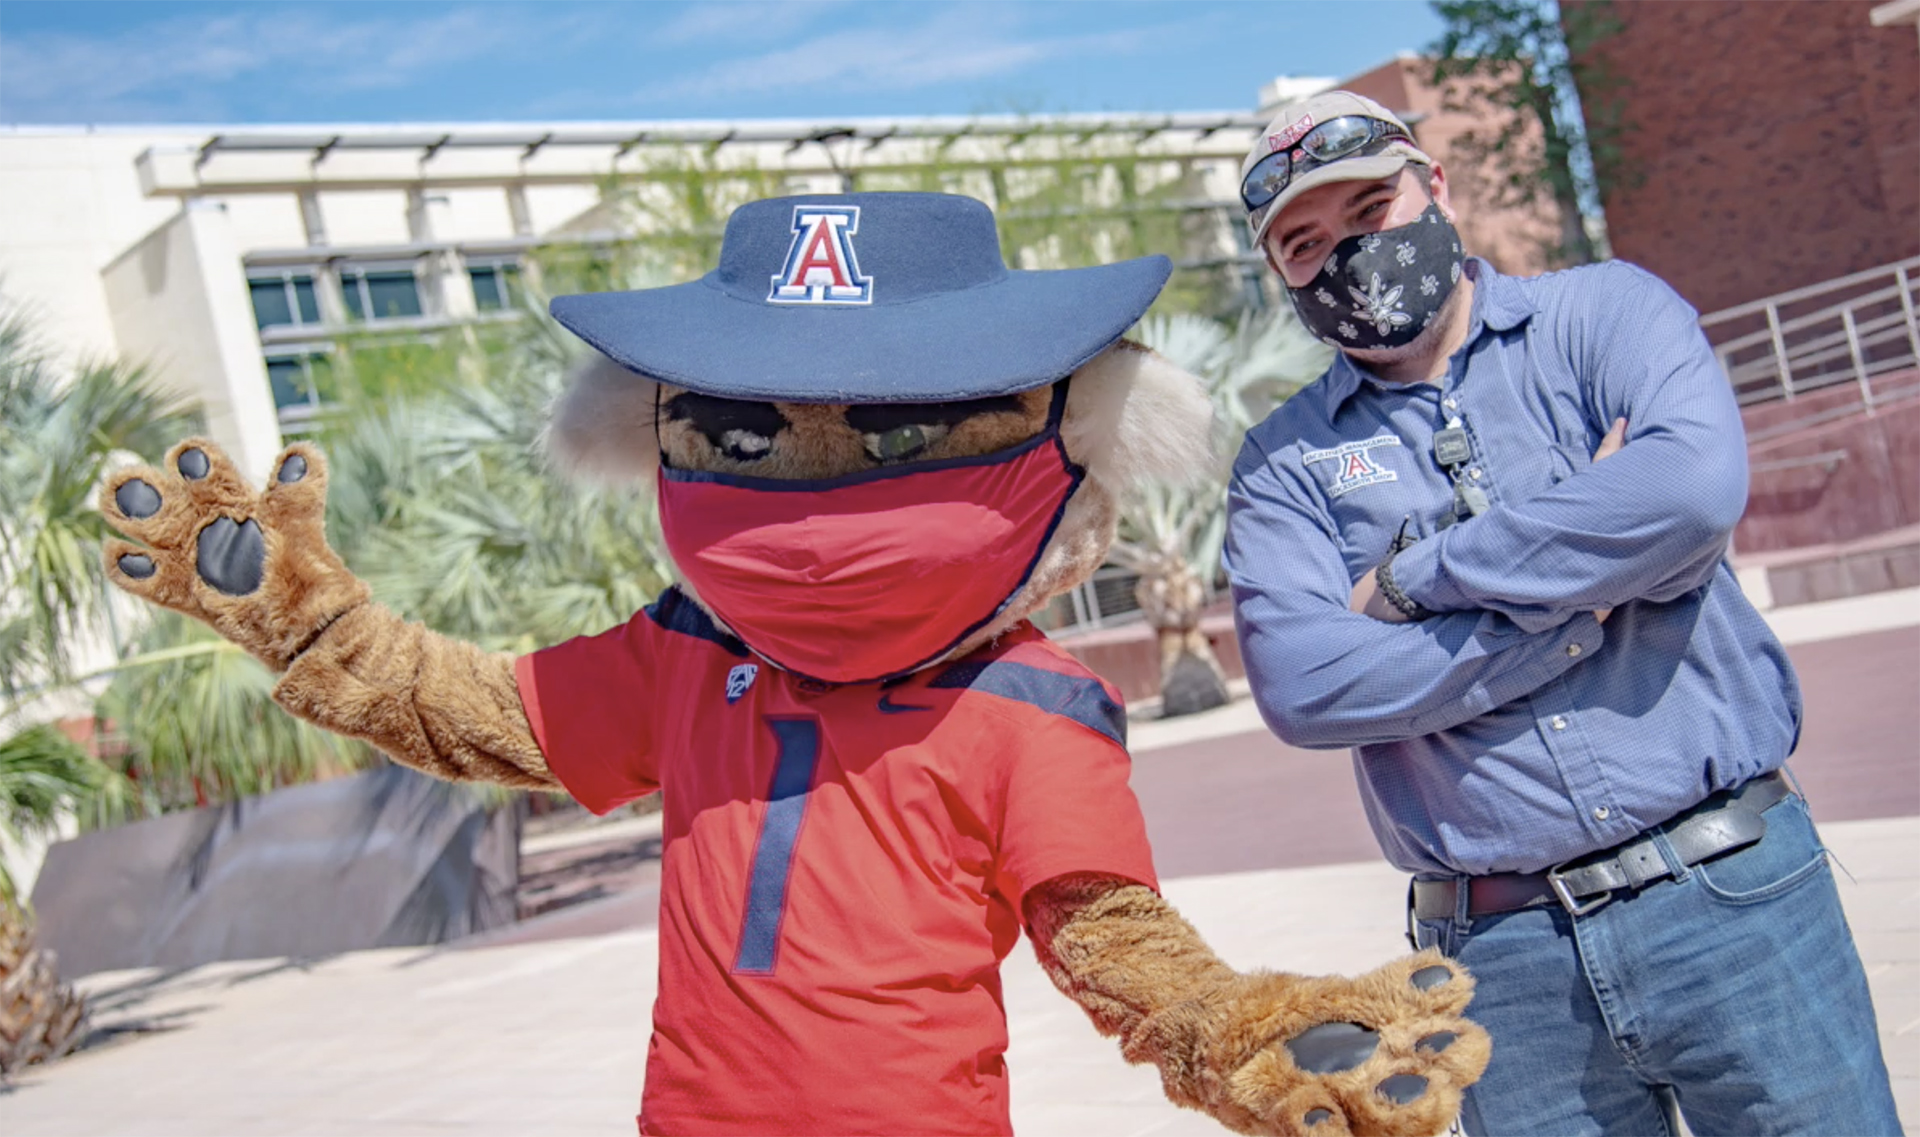 AU-staff-and-mascot